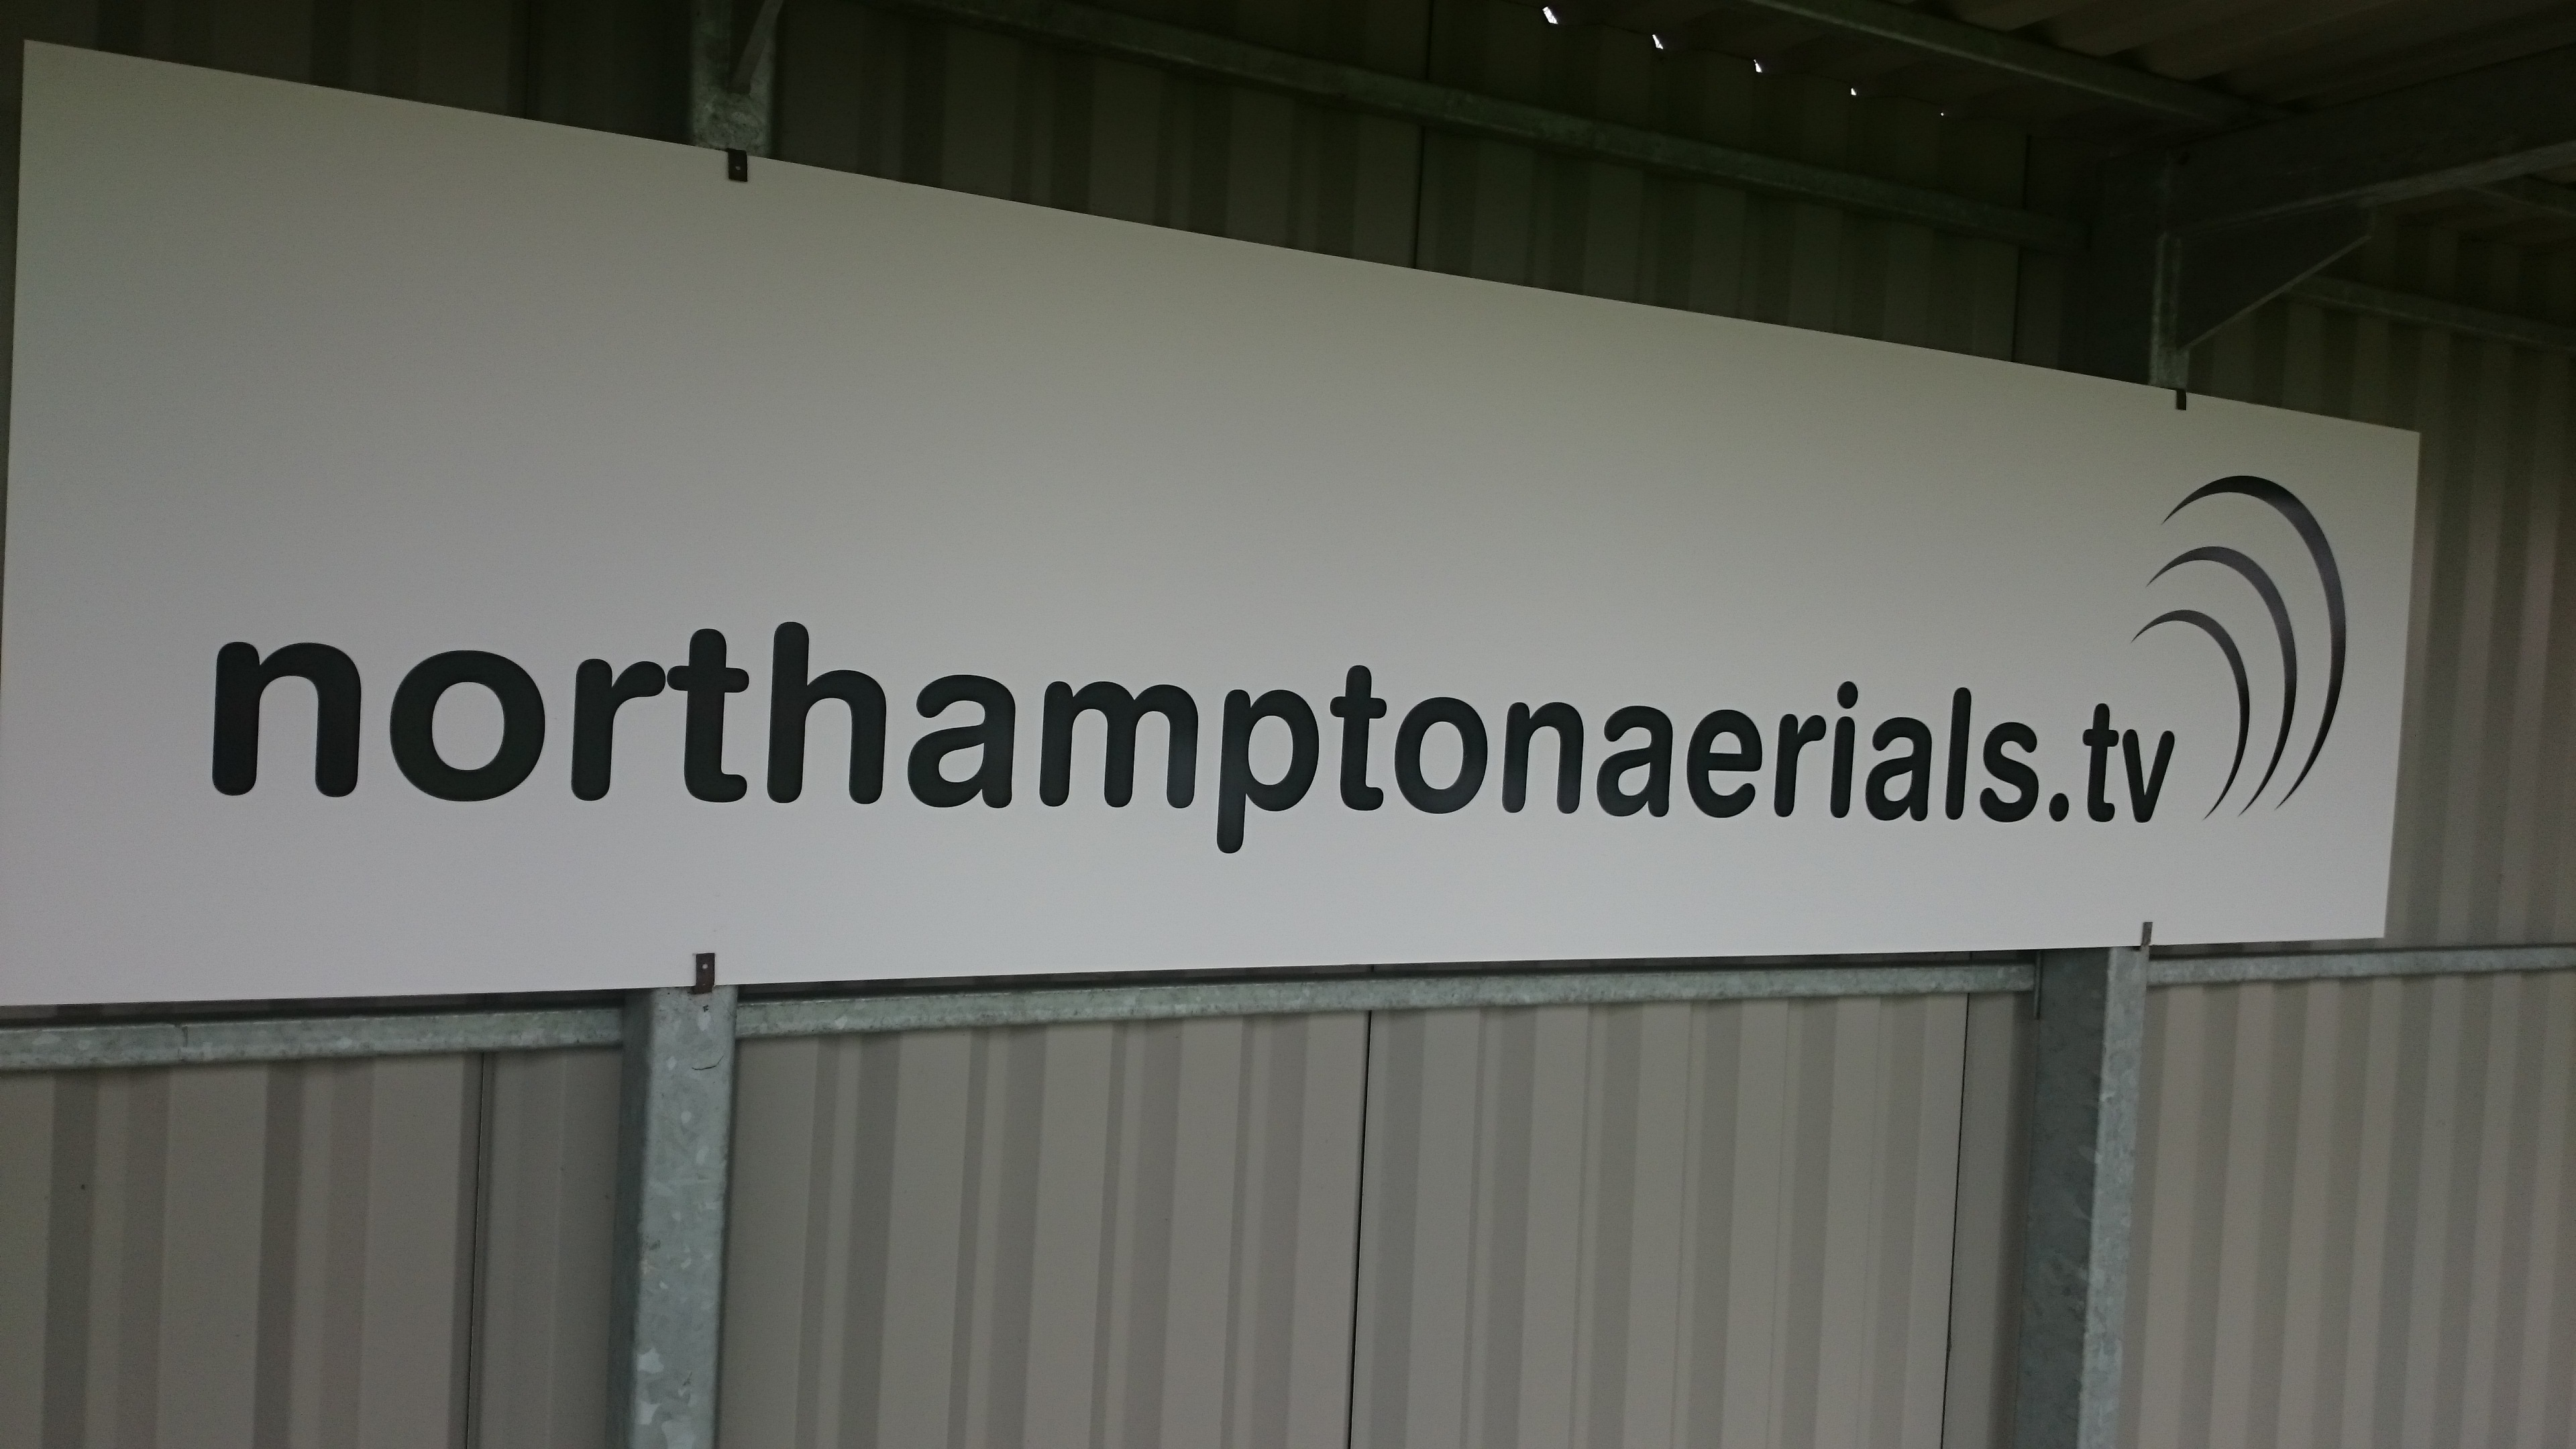 Northampton Aerials